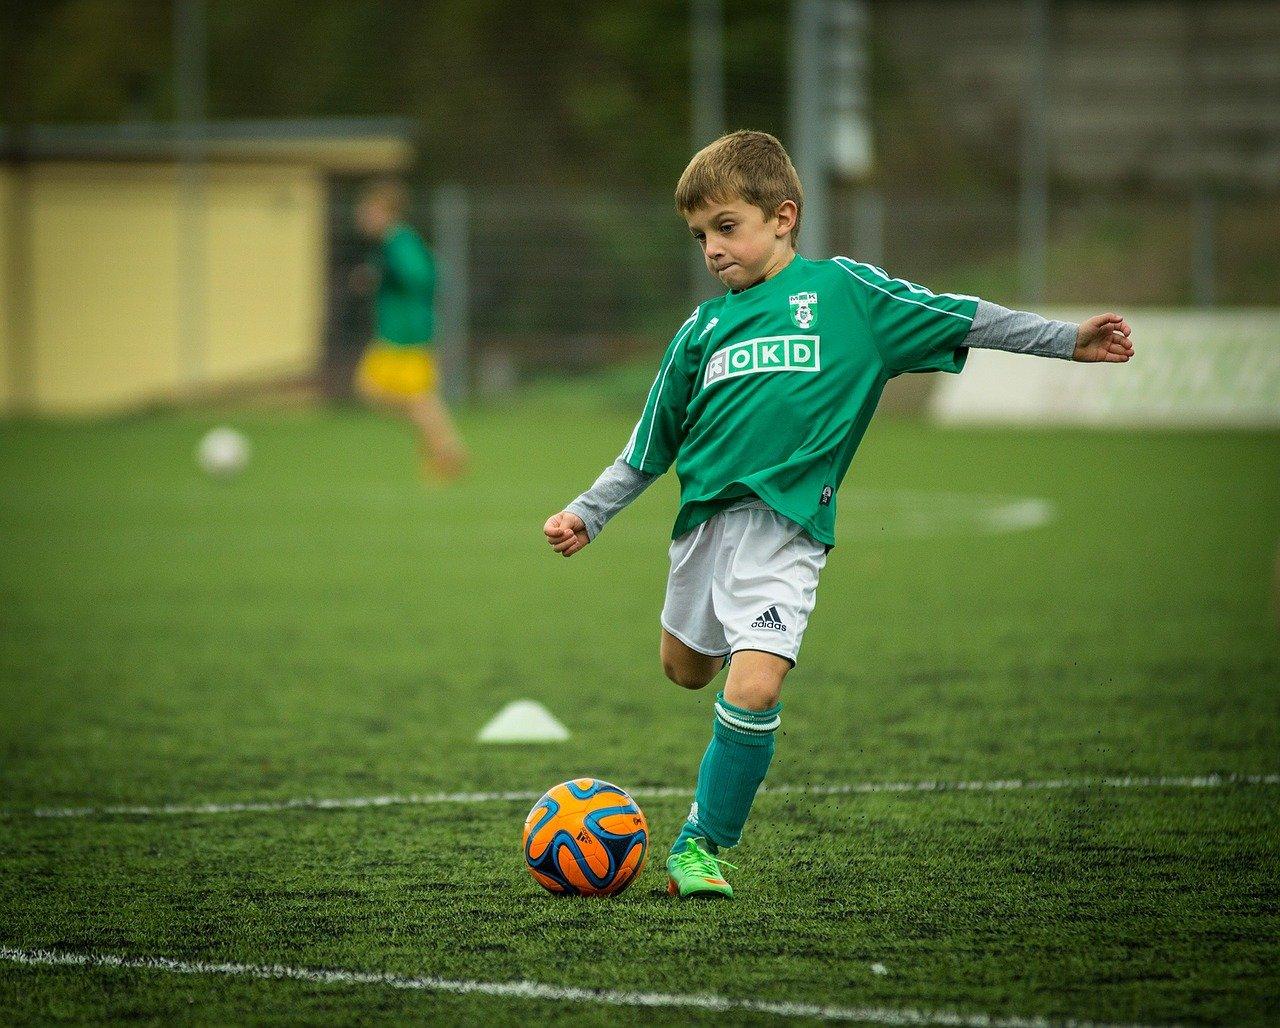 manfaat olahraga bagi anak anak